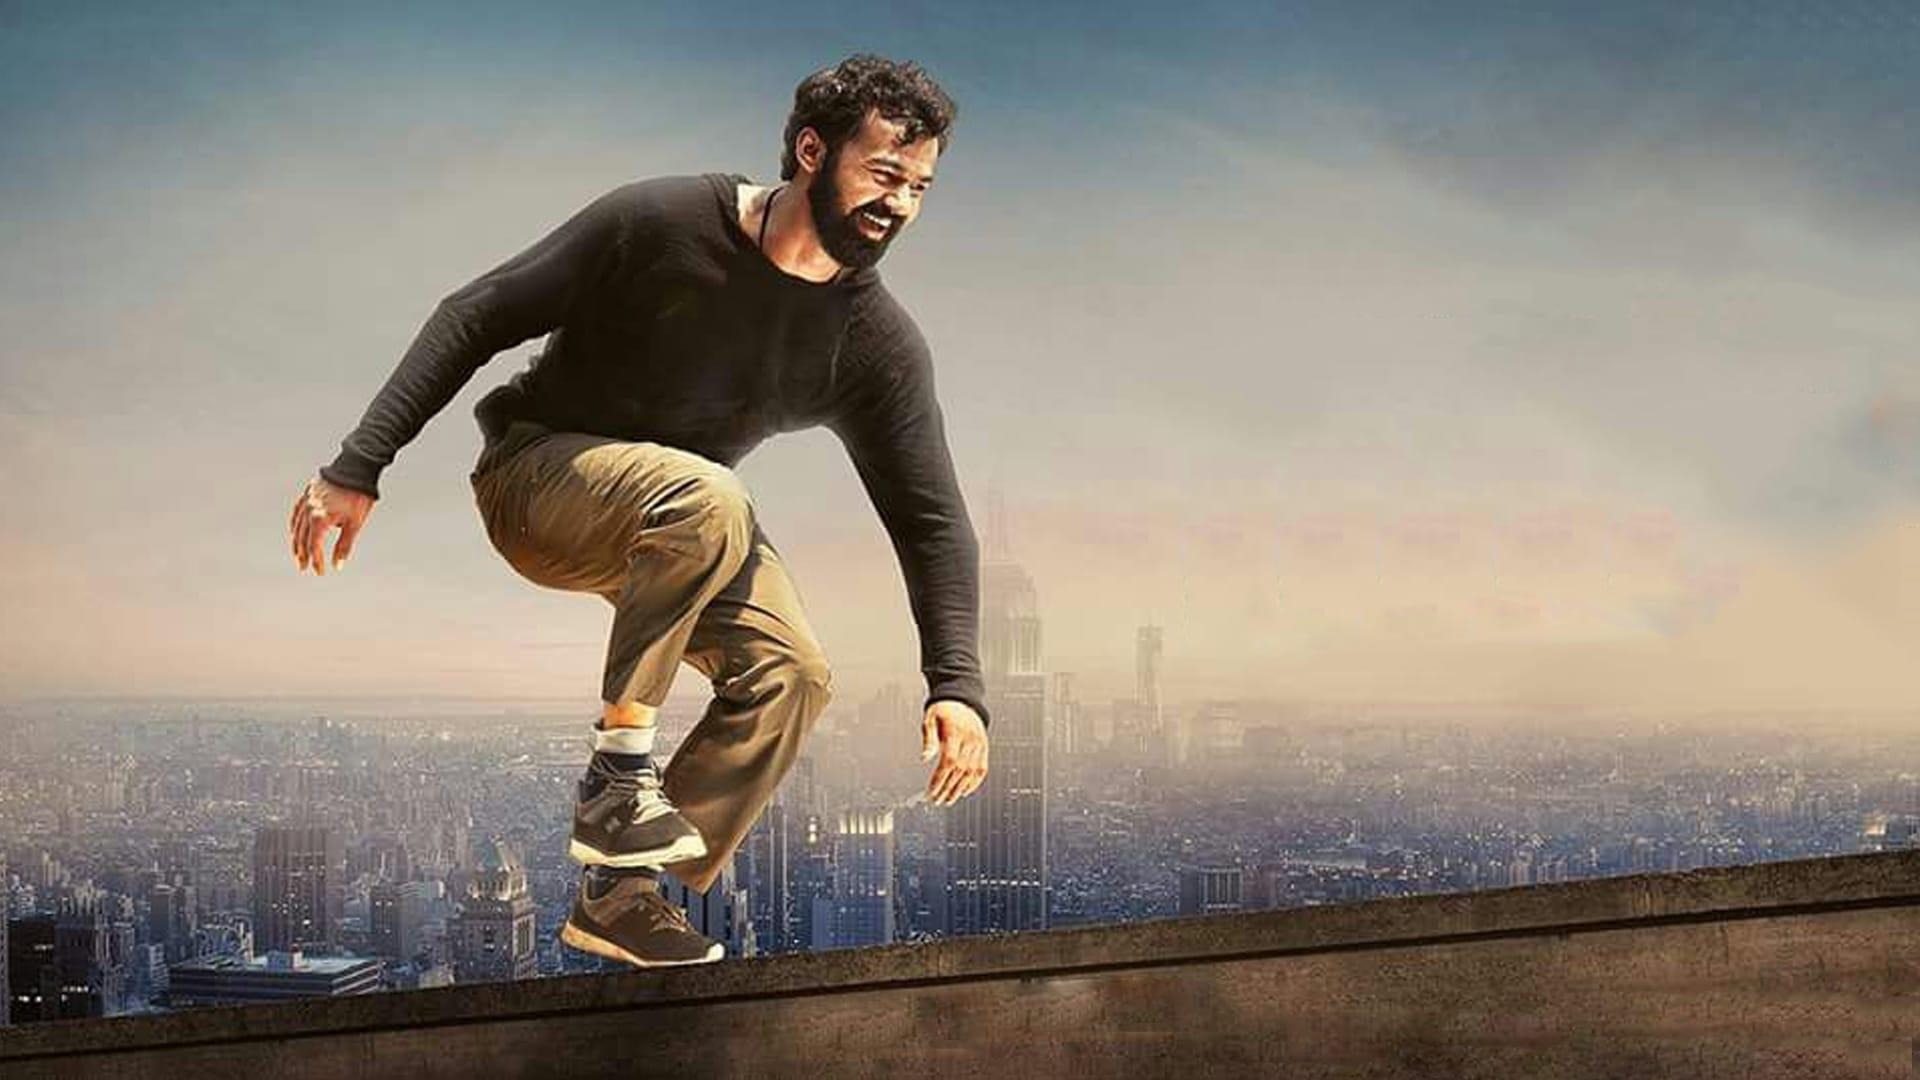 aadhi 2018 dvdscr full movie watch online malayalam full